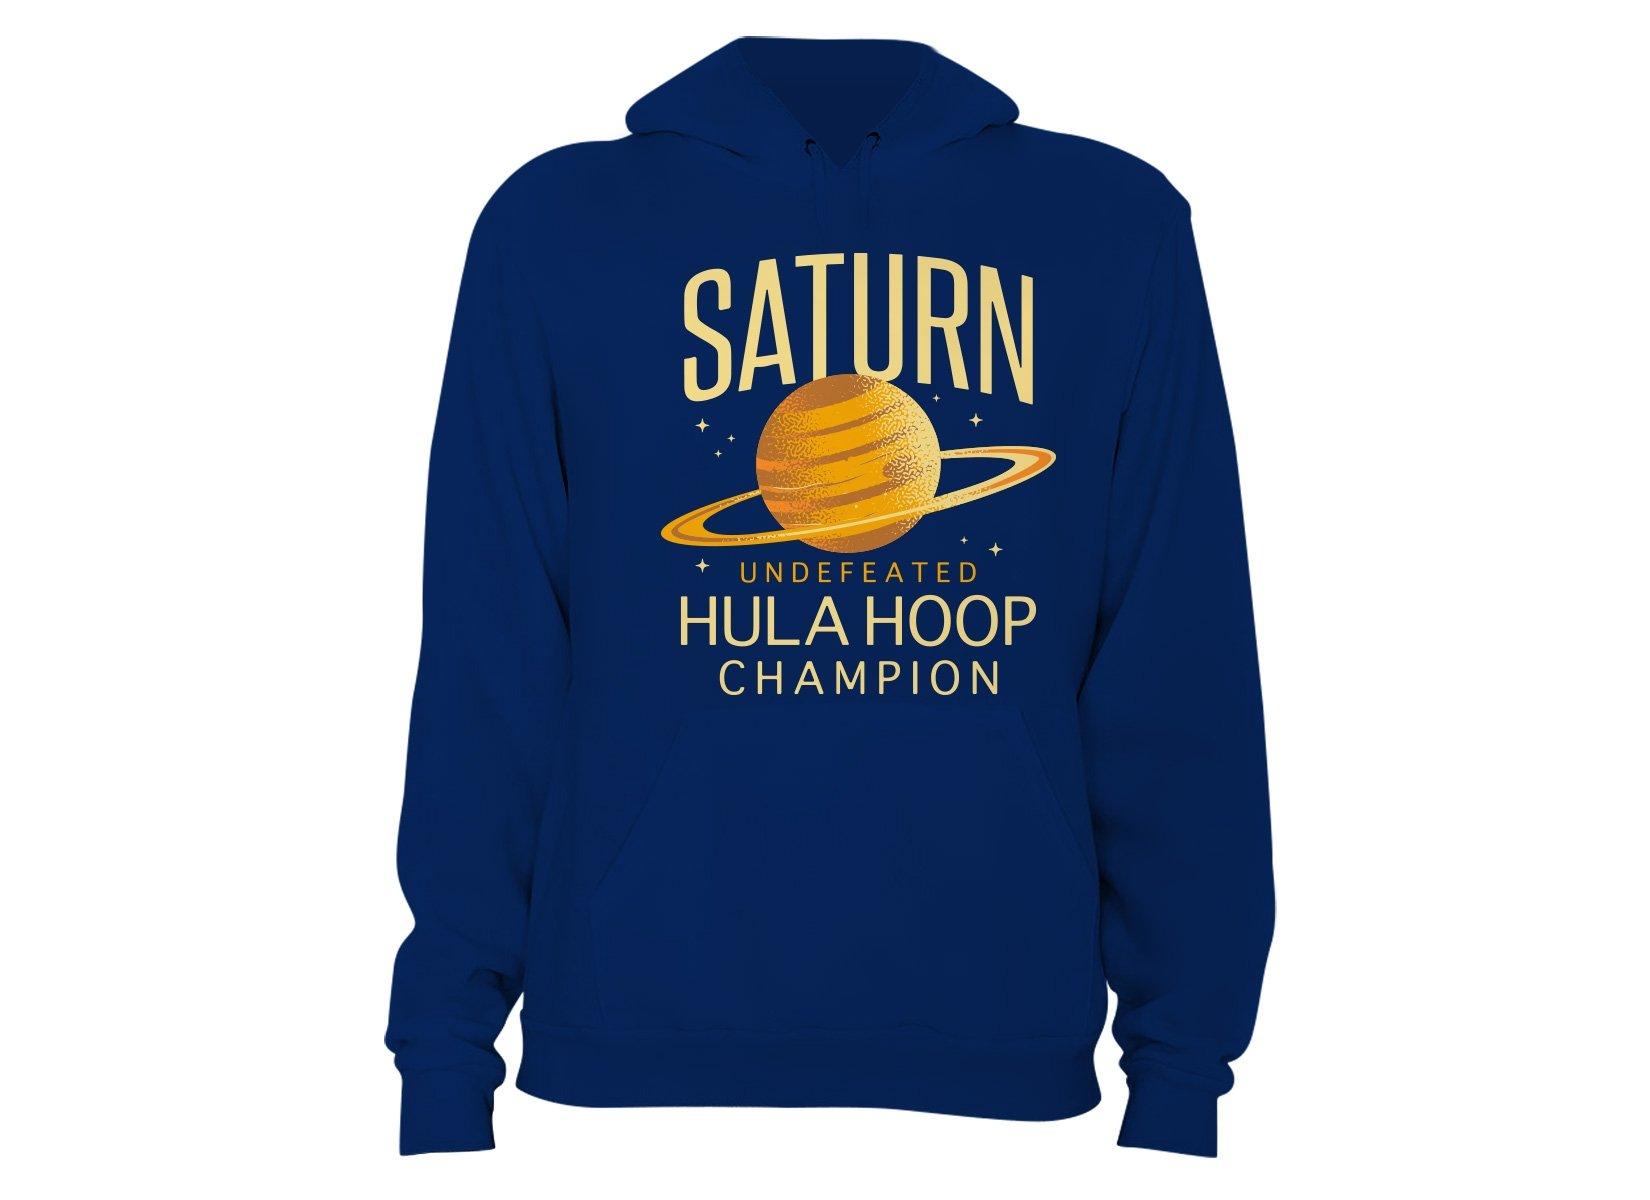 Undefeated Hula Hoop Champion on Hoodie